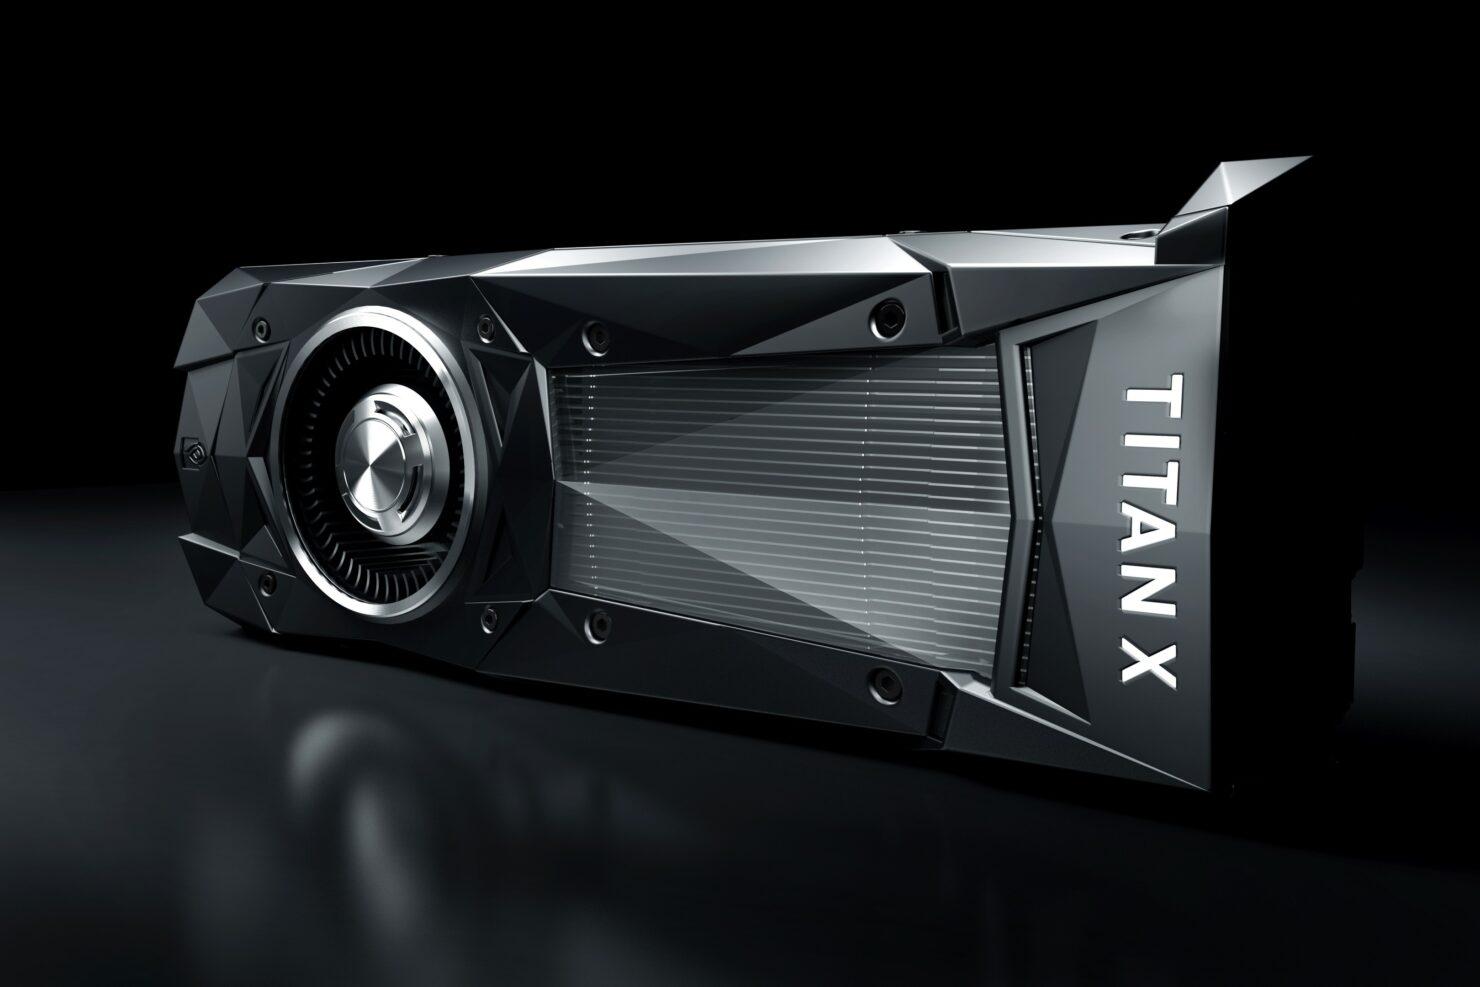 nvidia-titan-x-graphics-card_4-custom